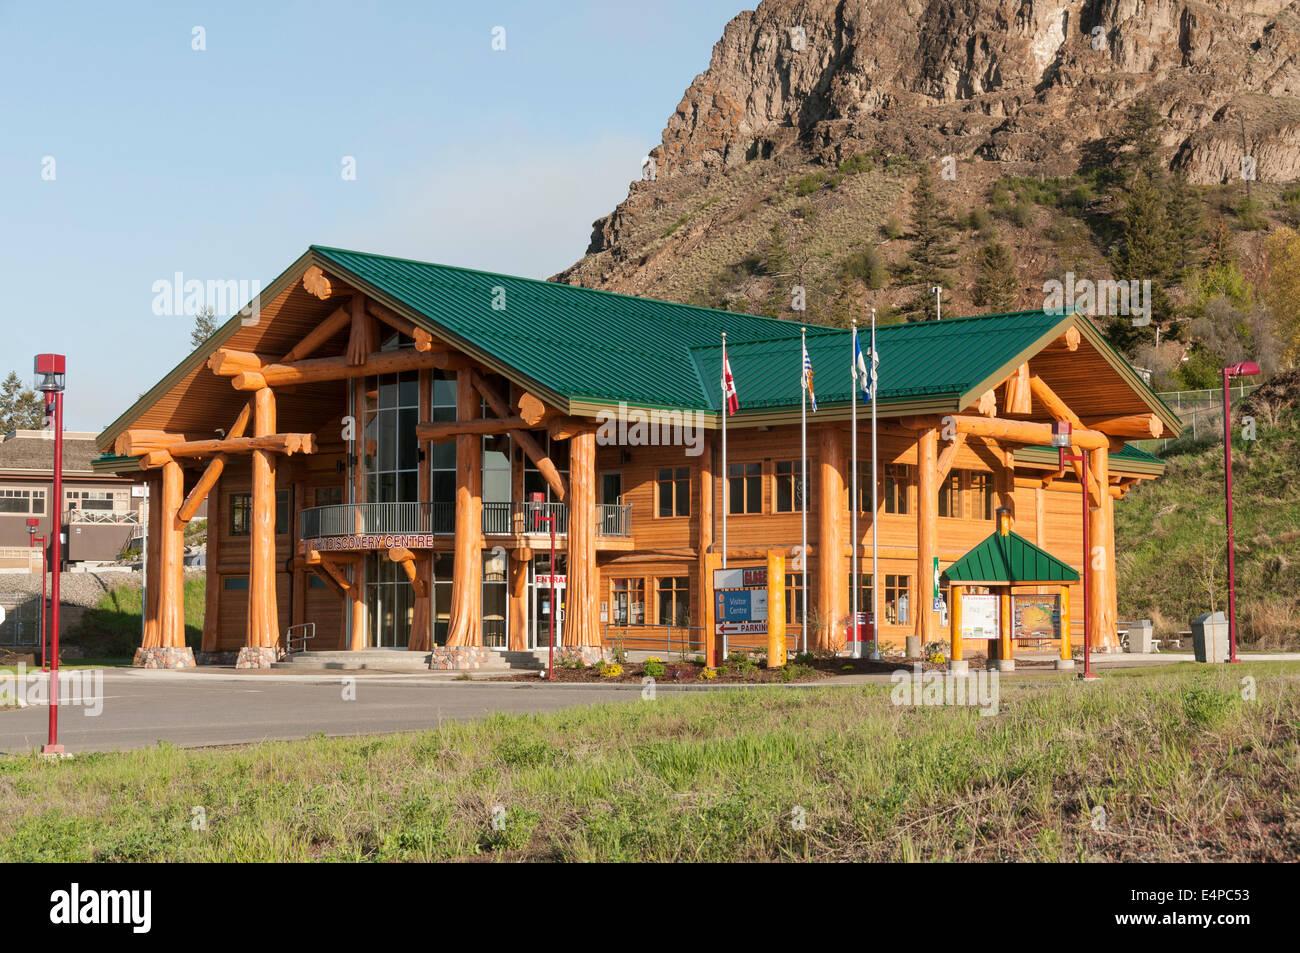 Elk203-3139 Canada, British Columbia, Williams Lake, Tourism Discovery Center - Stock Image